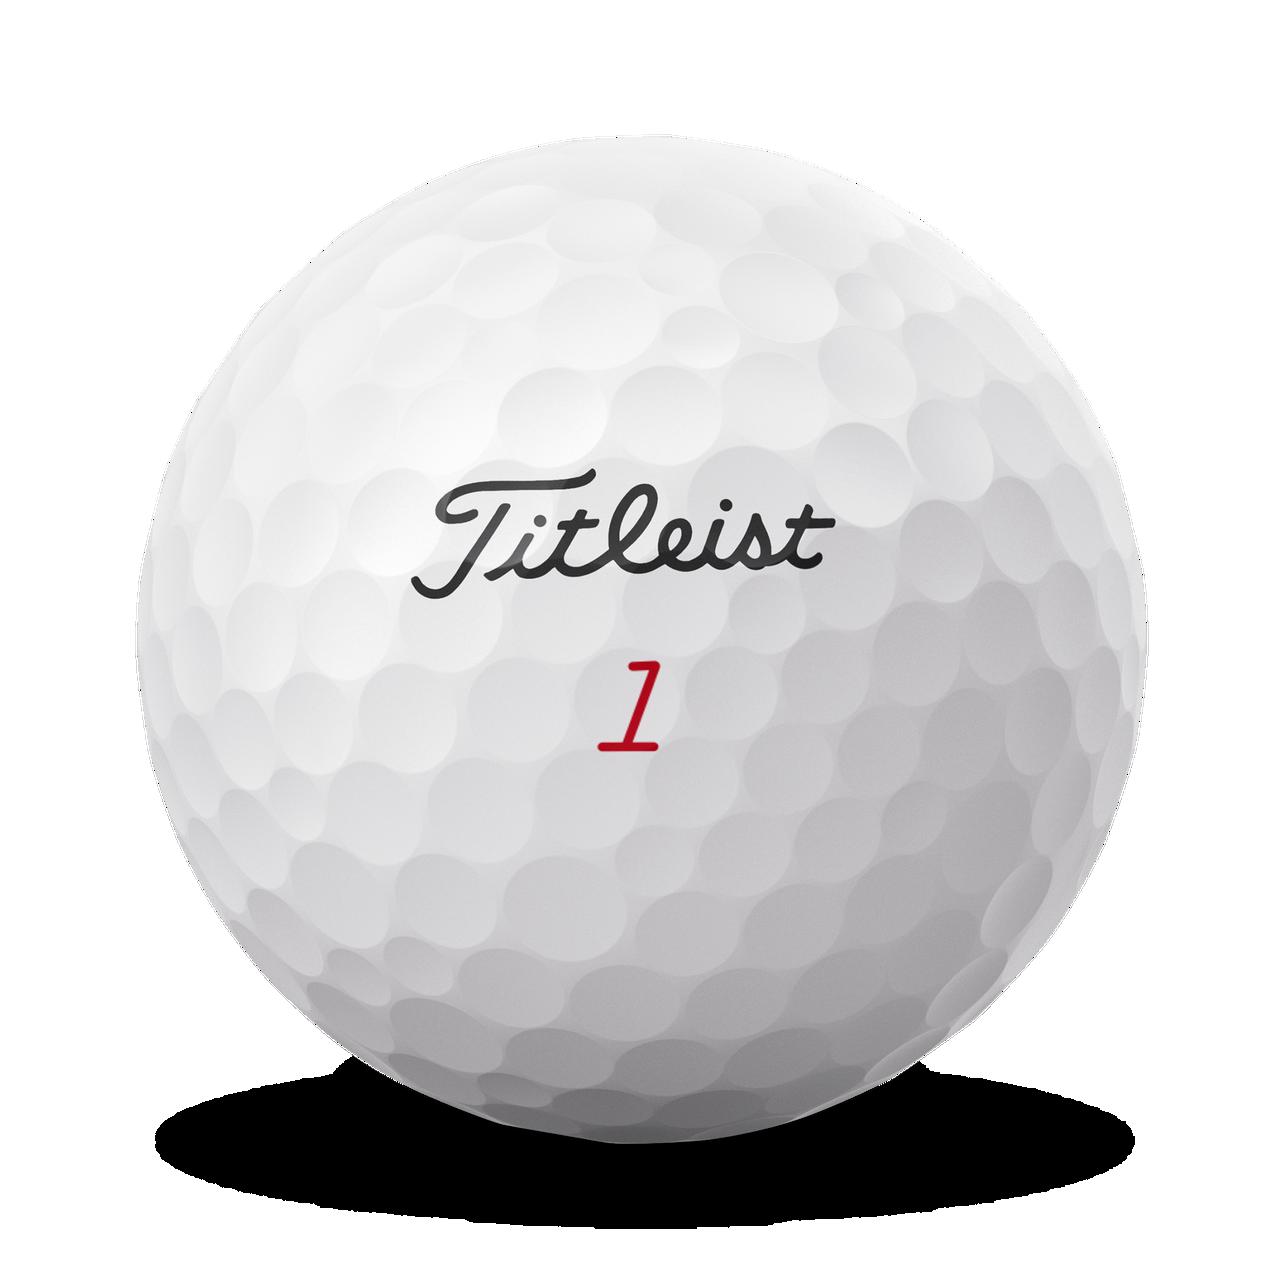 Titleist Personalized Pro V1x Dozen Golf Balls 2021 - Left Dash Alignment